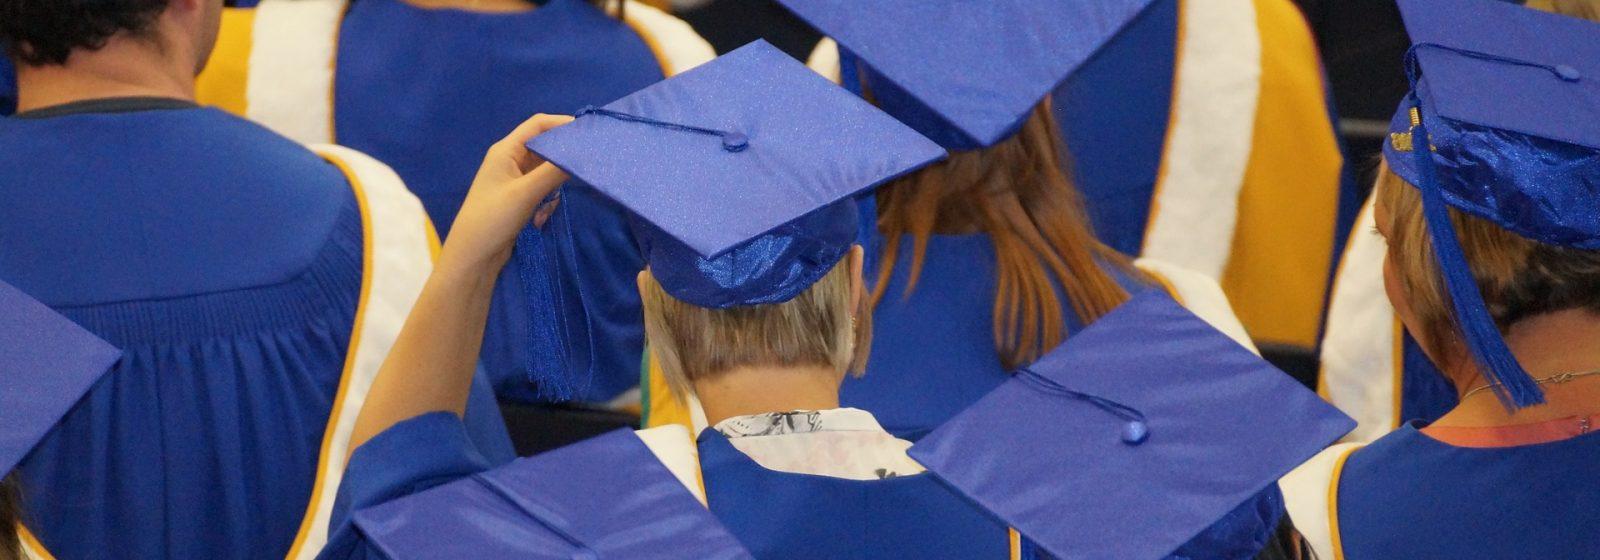 youth ministry, graduating seniors, prepare for graduation